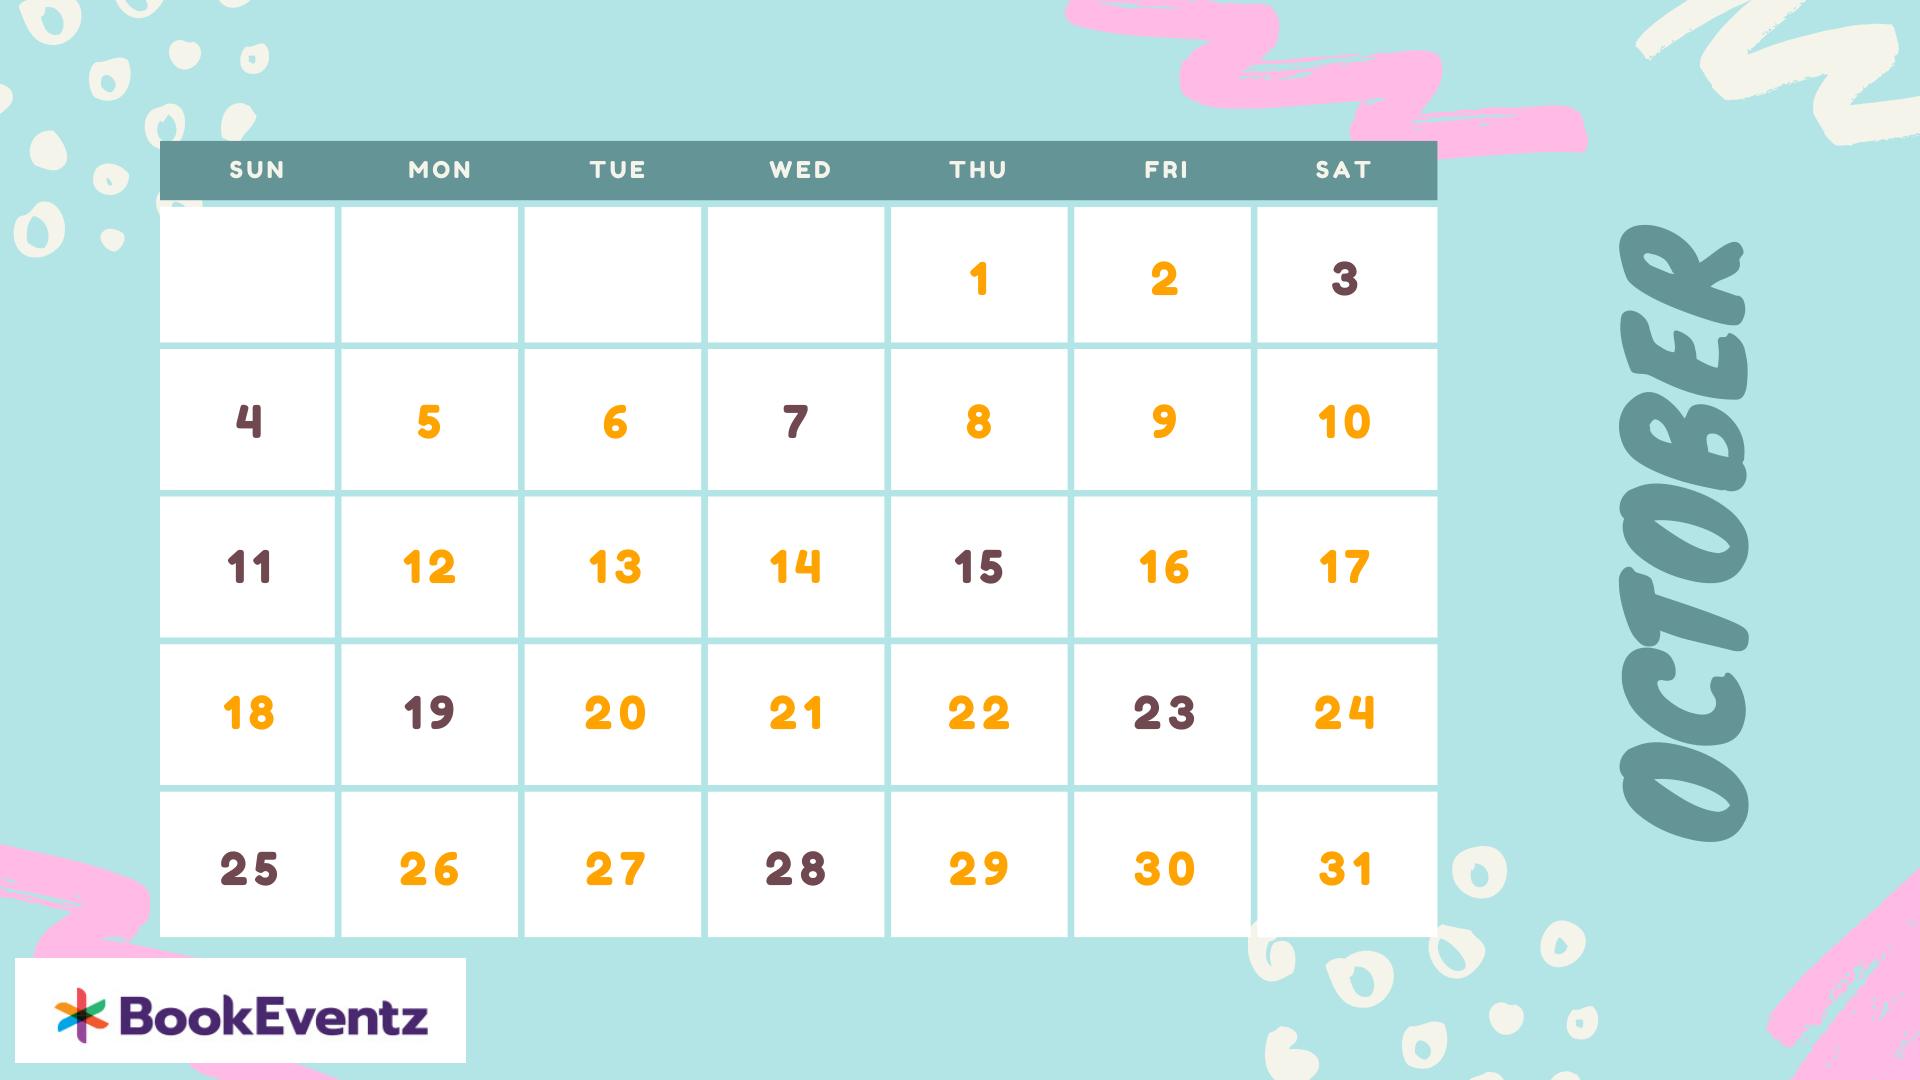 October Namkaran Muhurat Dates 2020